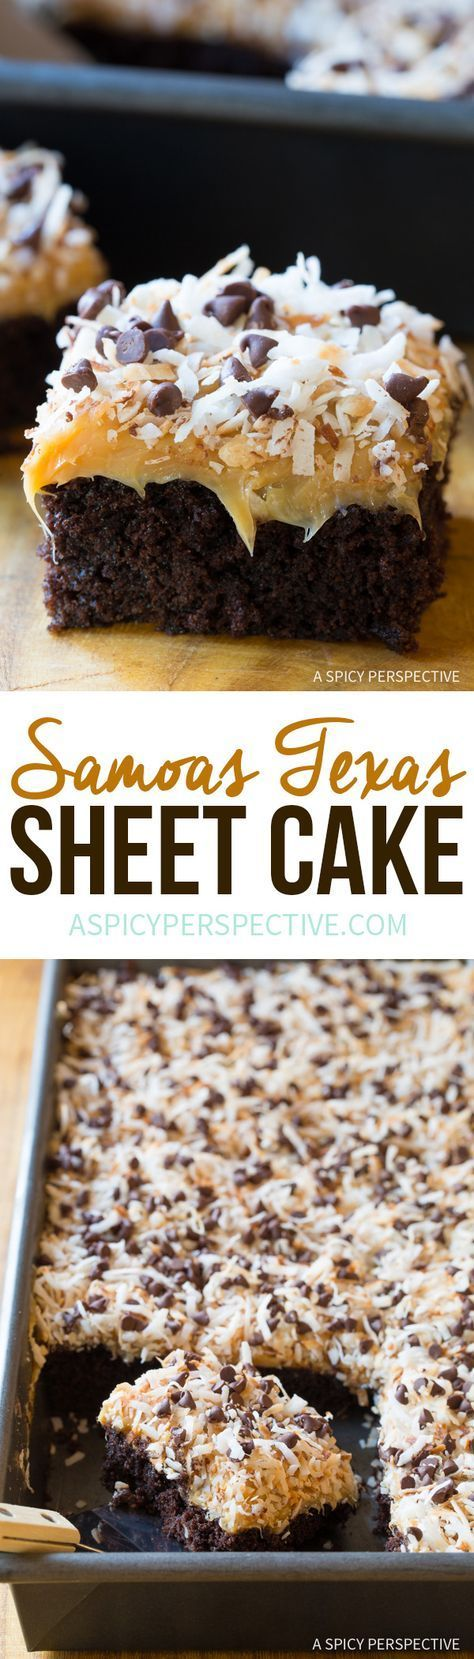 Amazing Samoas Texas Sheet Cake Recipe via /spicyperspectiv/